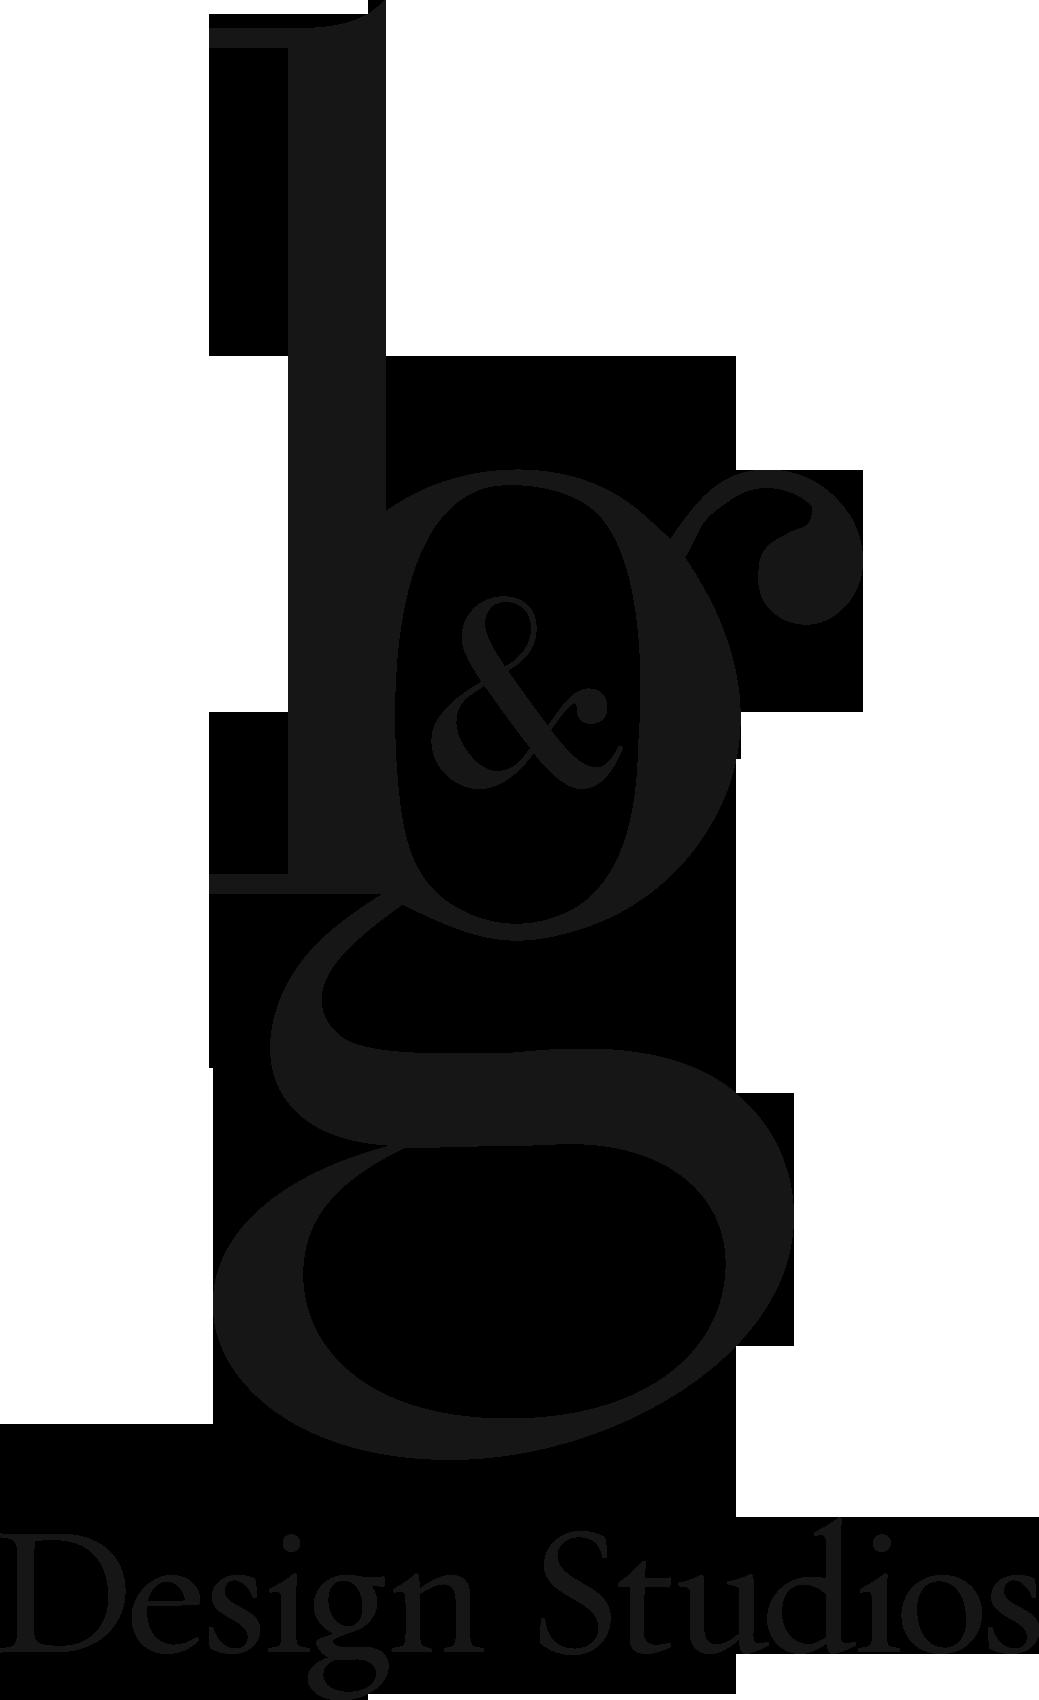 B&G Design Studios